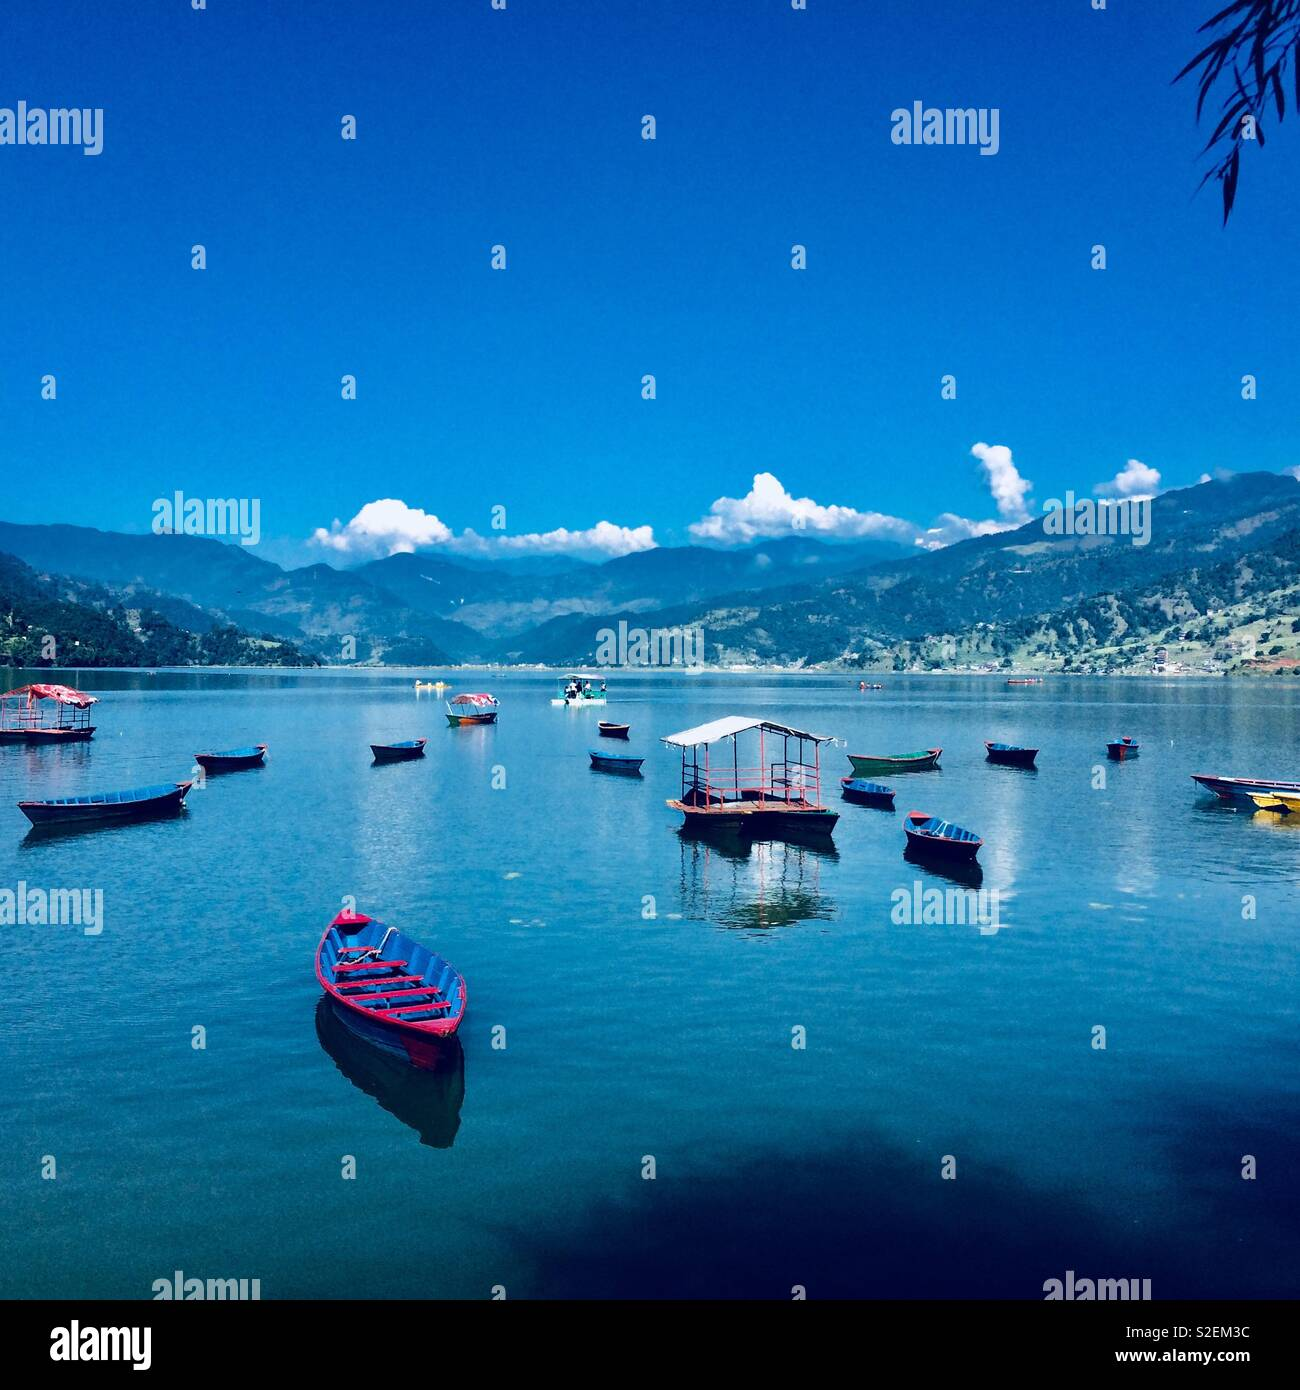 Phewa lake magical boats - Stock Image